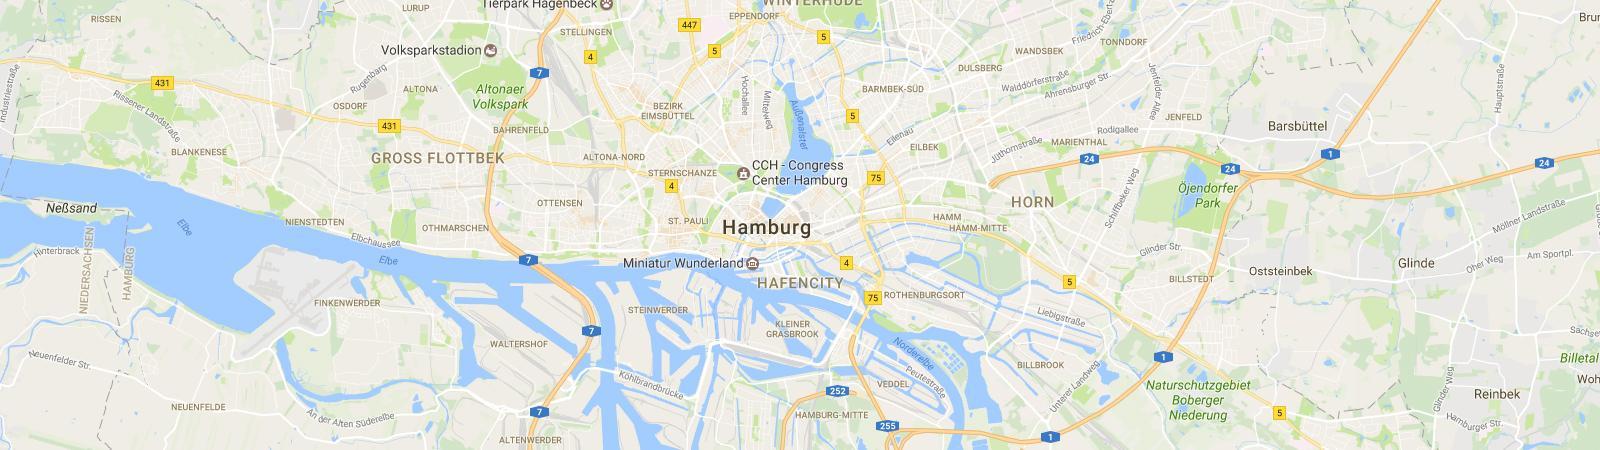 DriveNow-Carsharing-Hamburg-Fahrzeuge-Fahrt-Hamburger-Staedten-HVV-Kurzstrecke-Langestrecke-greenwhels-car2go-mobilit-finanztip-sitze-anmeldegebuehr-Geschaeftsgebiet